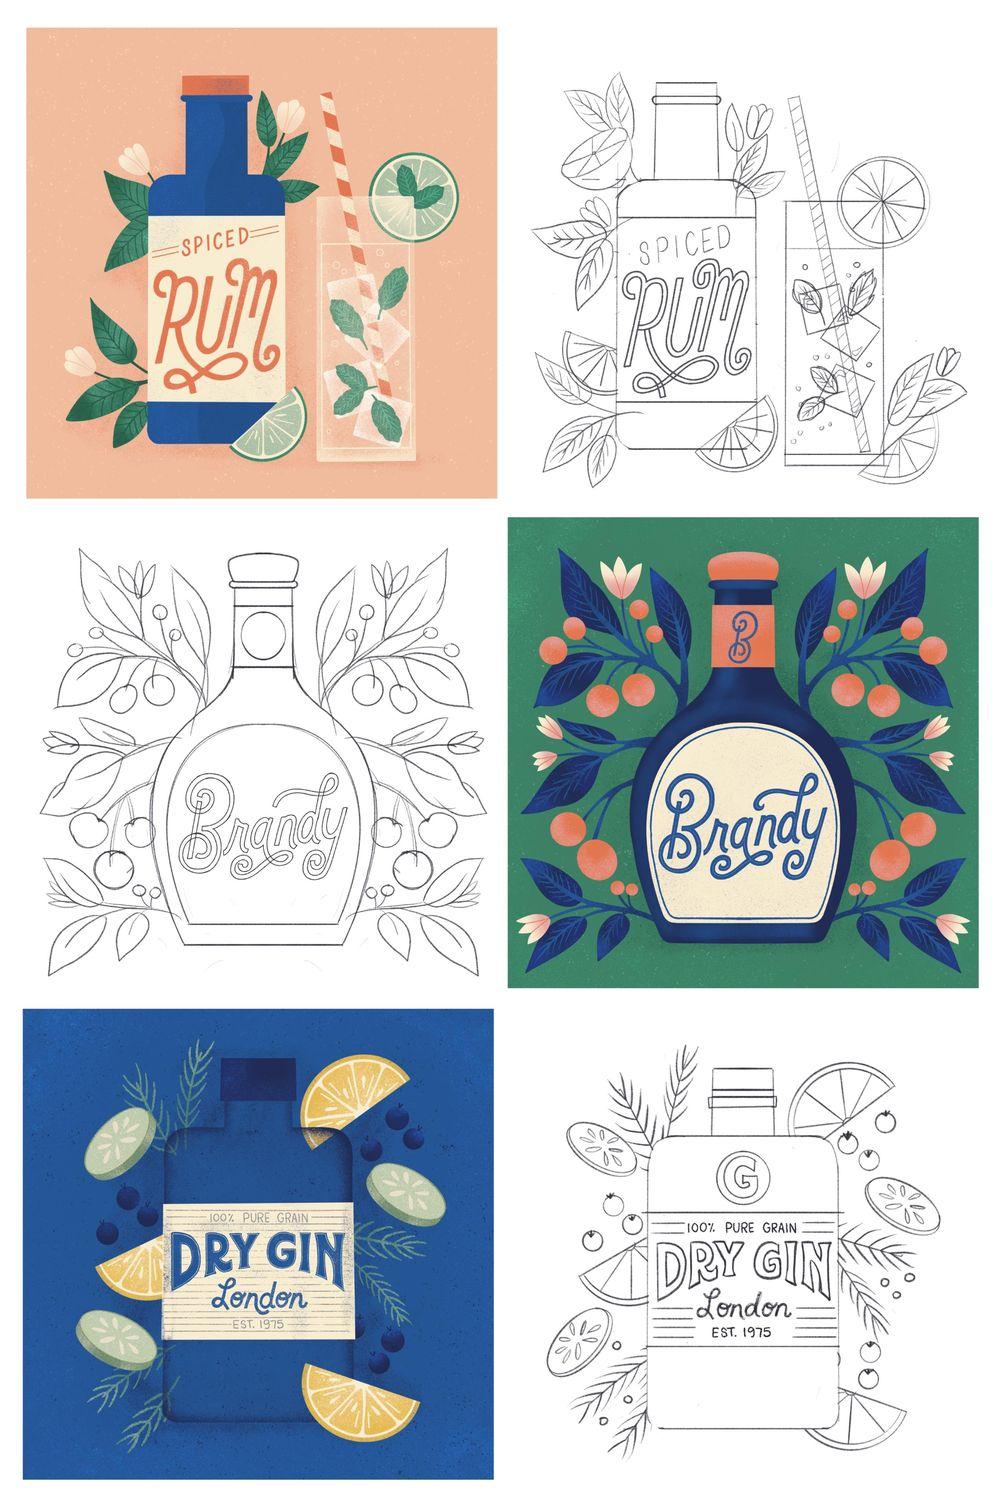 Illustration Style Exploration - image 4 - student project